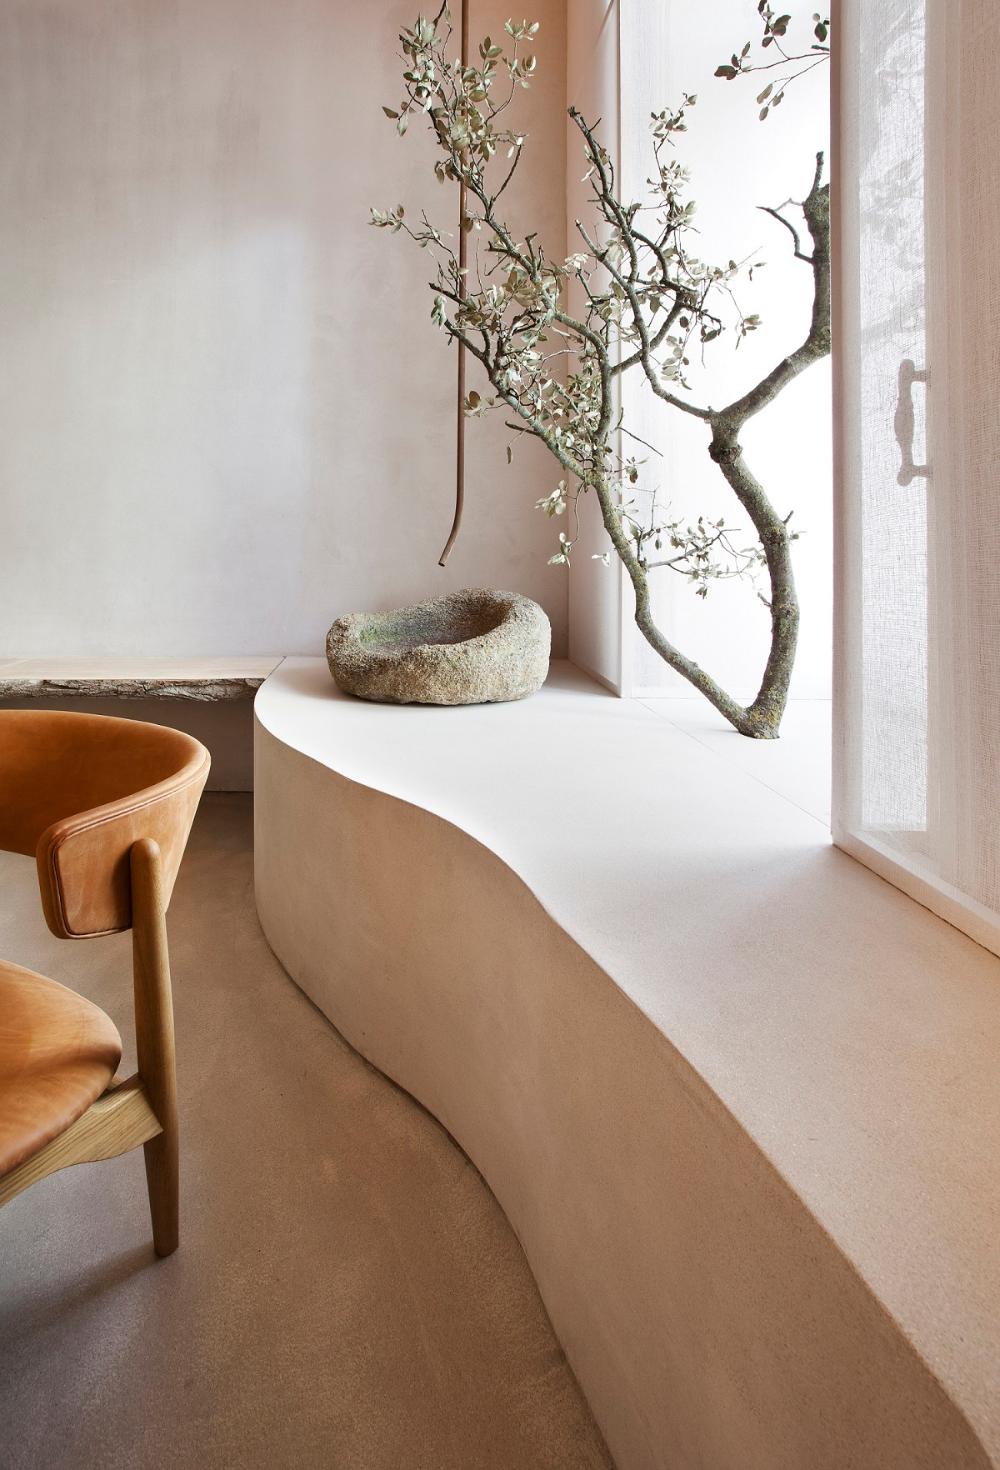 Wabi-Sabi Interior designed by Lorna de Santos – Design. / Visual.